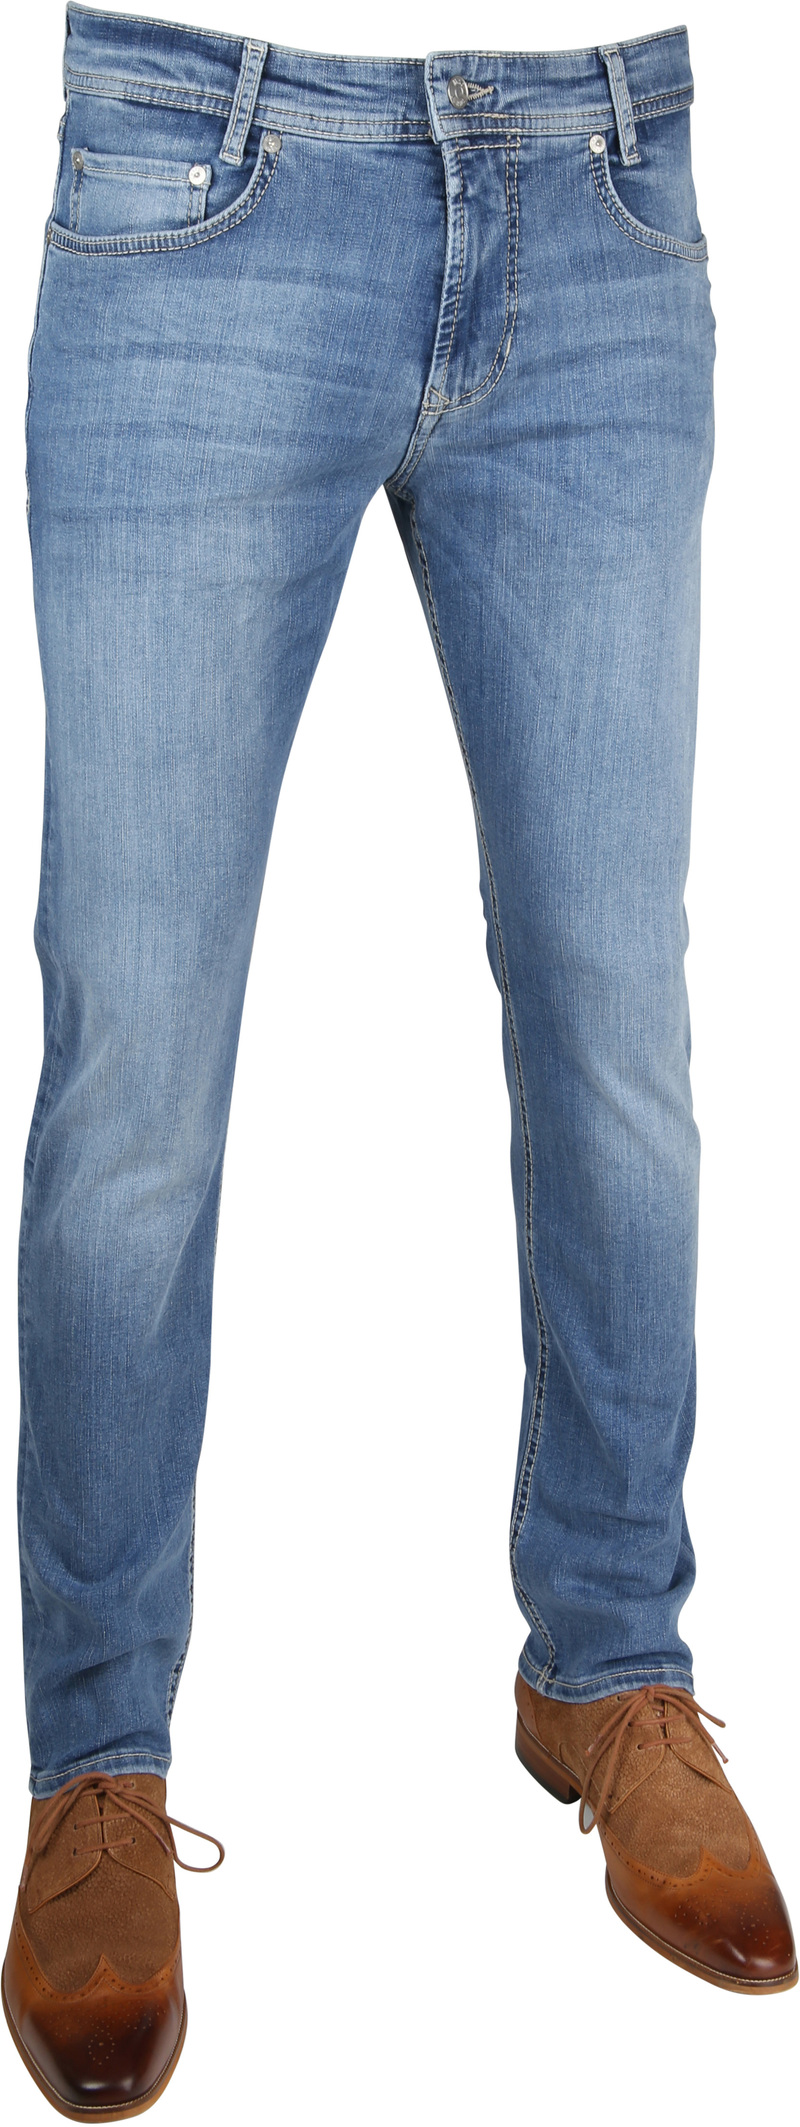 Mac Jeans MacFlexx Modern Fit H447 photo 0